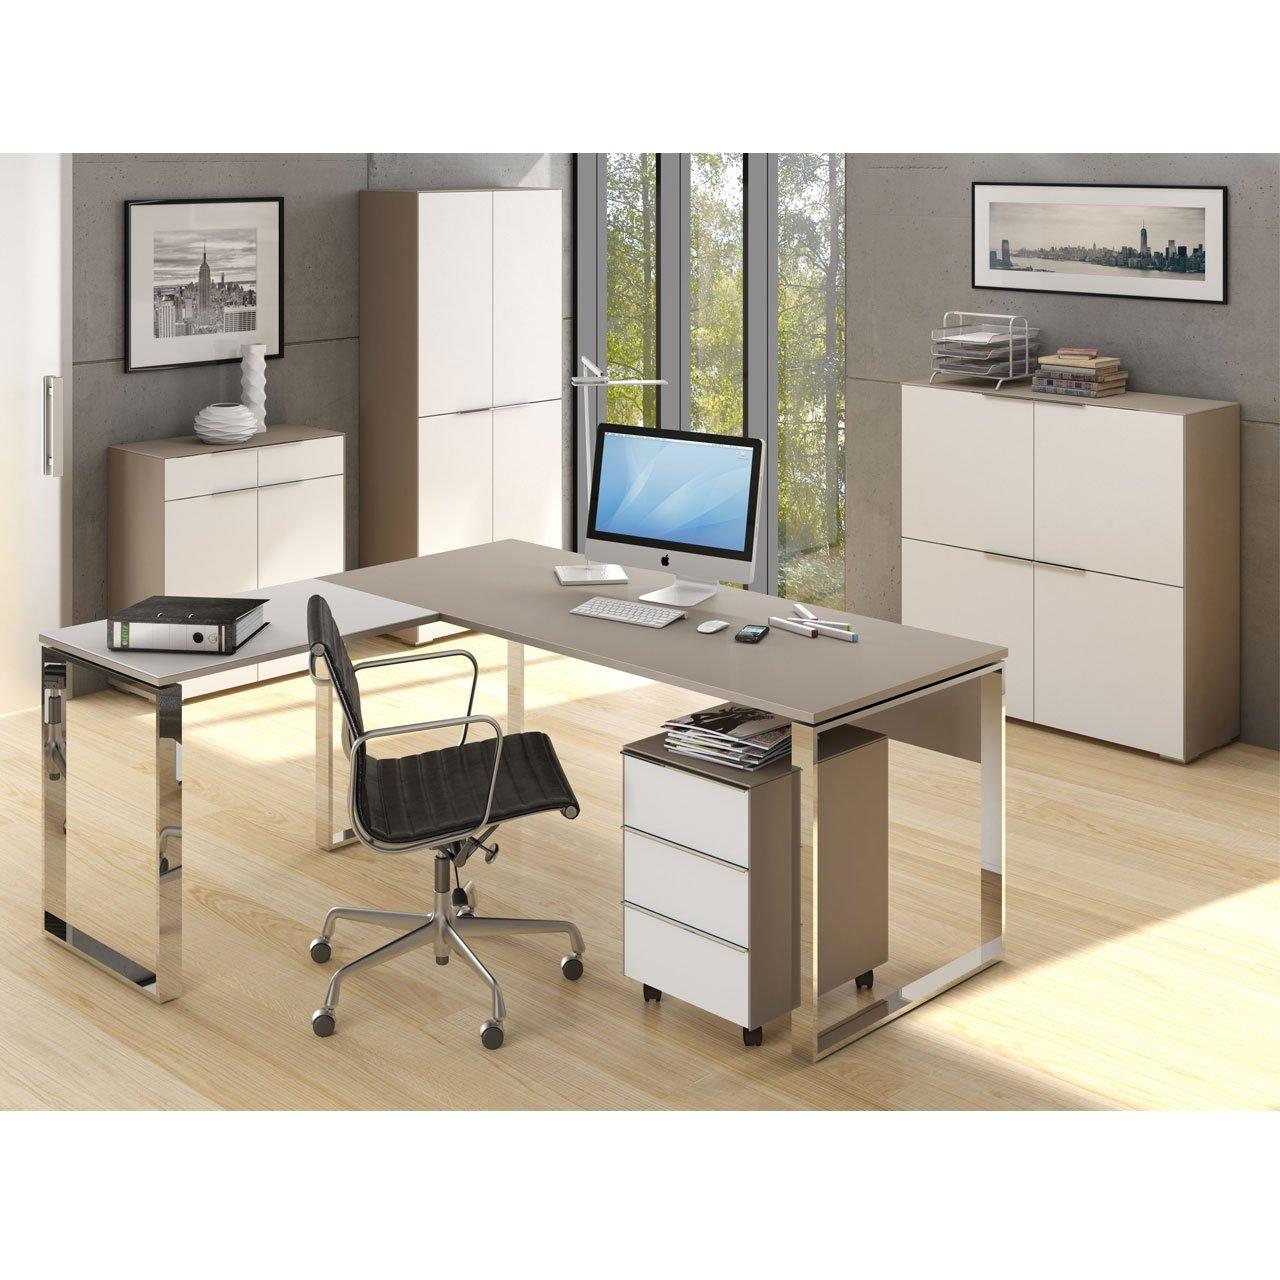 MAJA Büromöbel Komplettset Komplettes Arbeitszimmer YAS in Glas sand ...